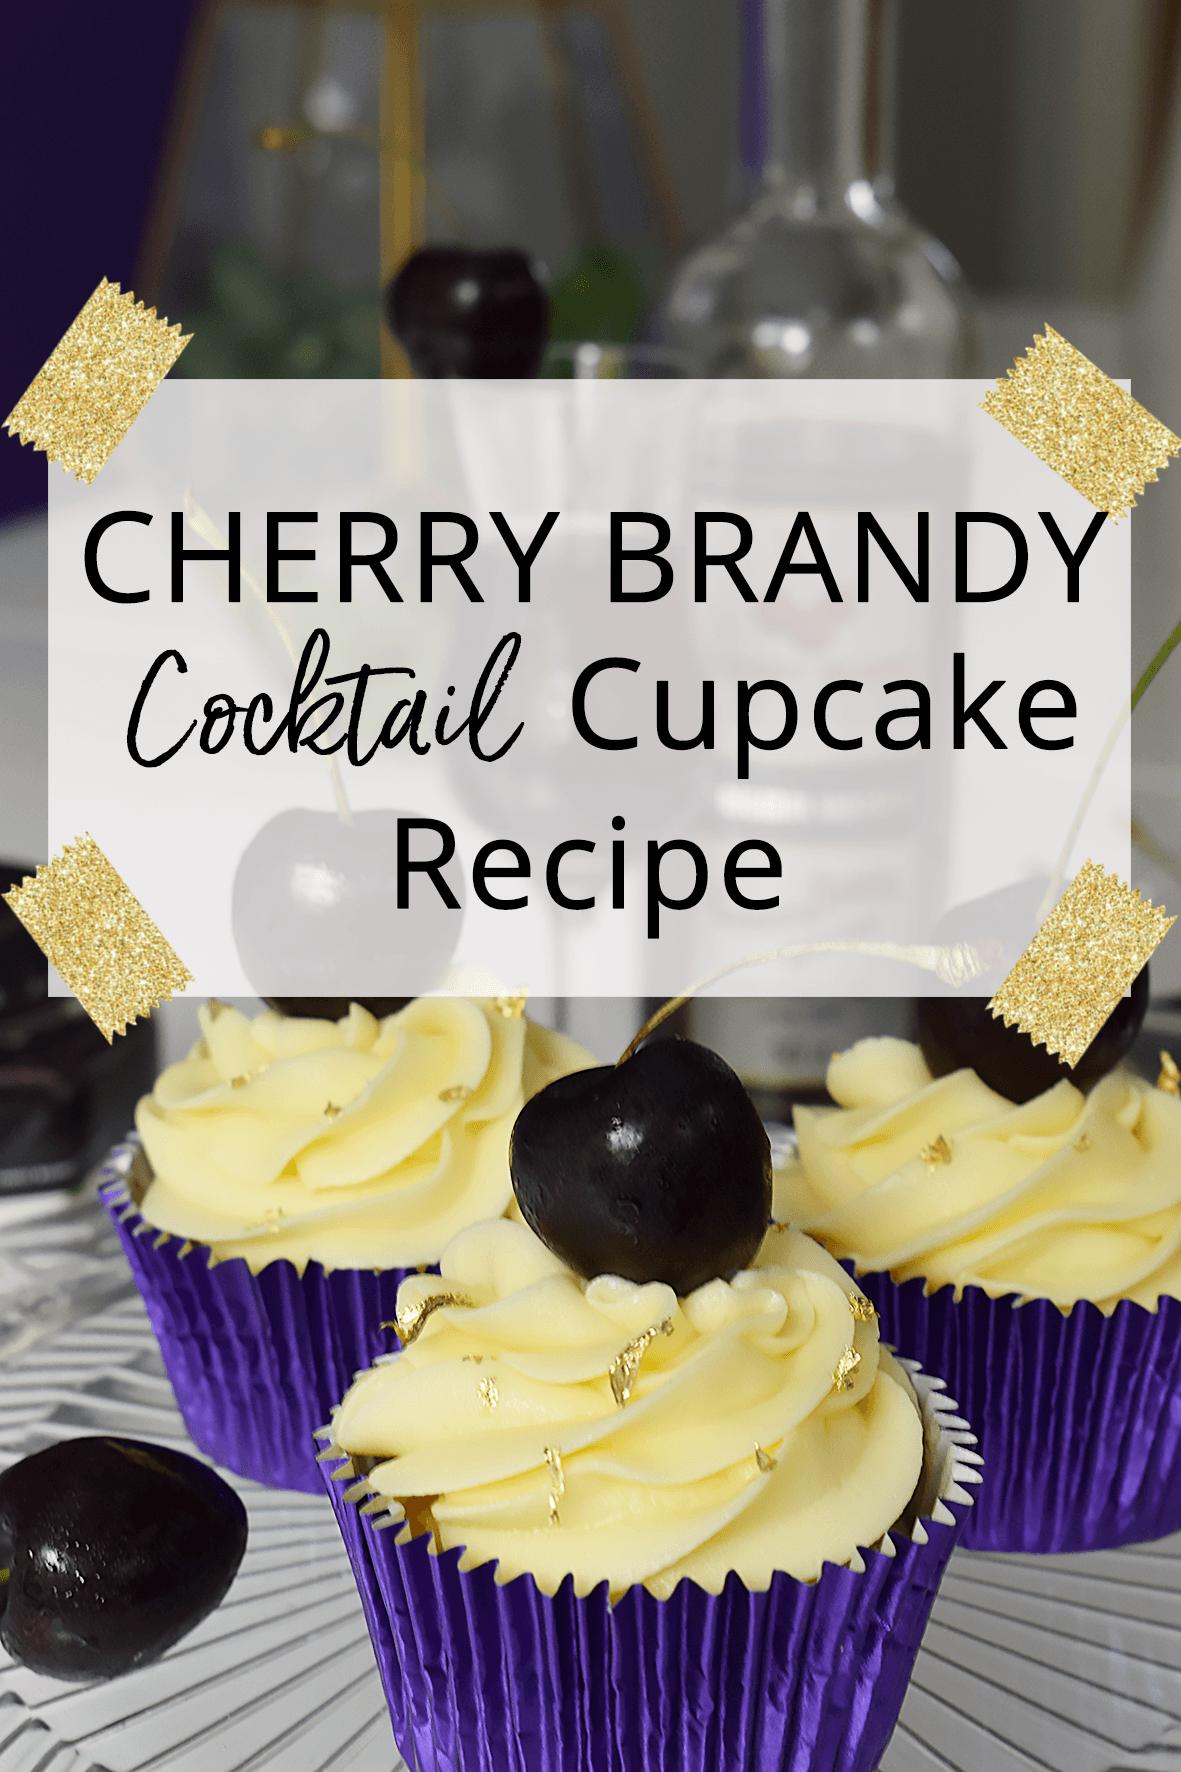 Cherry Brandy Cocktail Cupcake Recipe